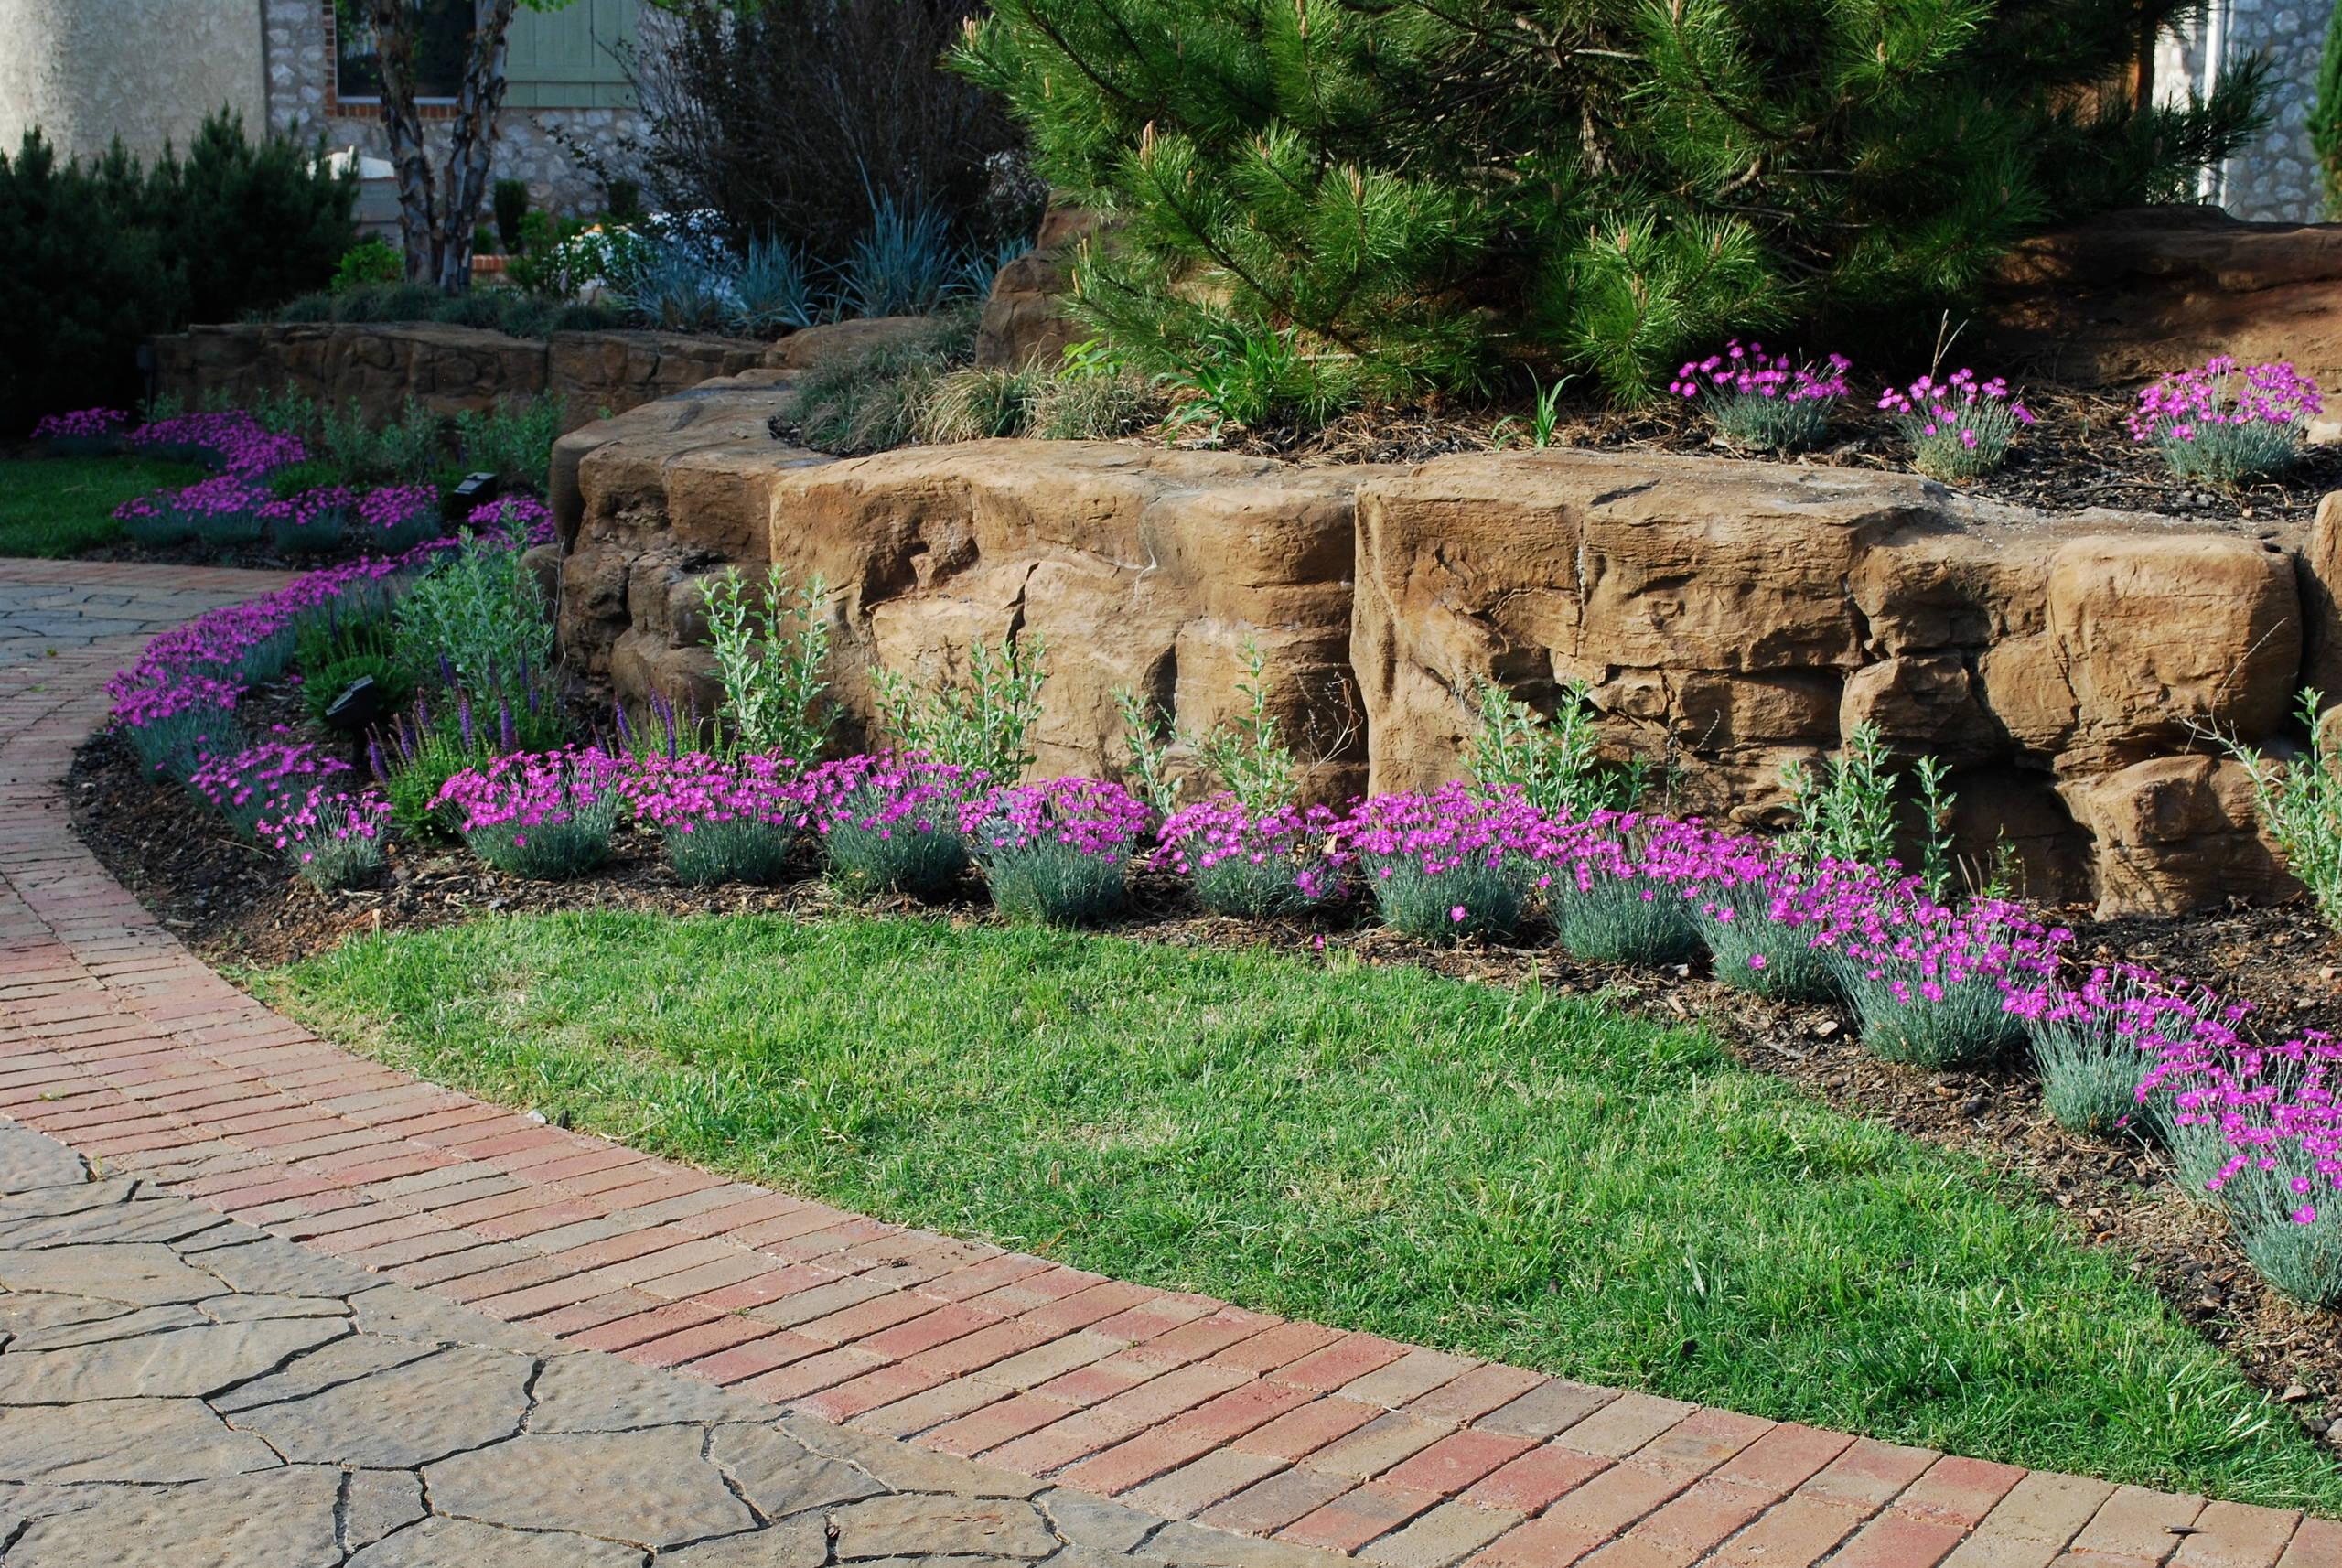 BSR Front Garden 6 months after reno.